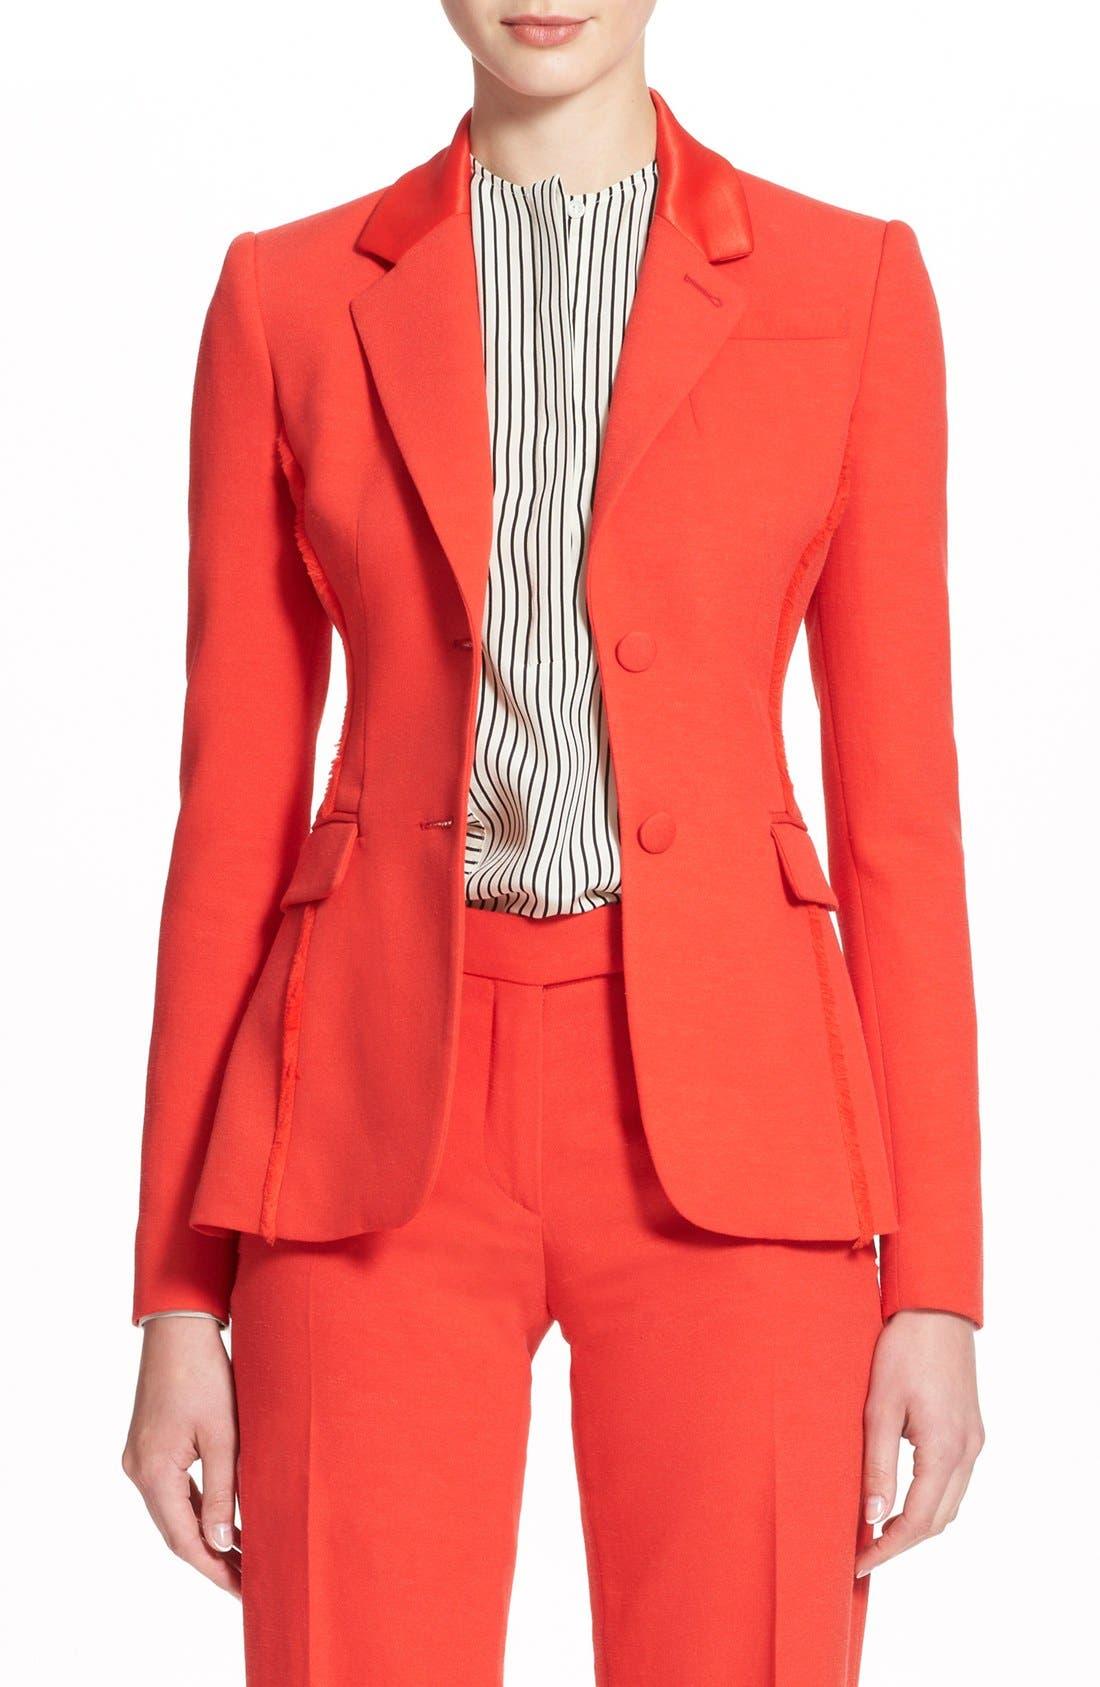 Main Image - Altuzarra 'Fenice' Textured Blazer with Fraying Fringe